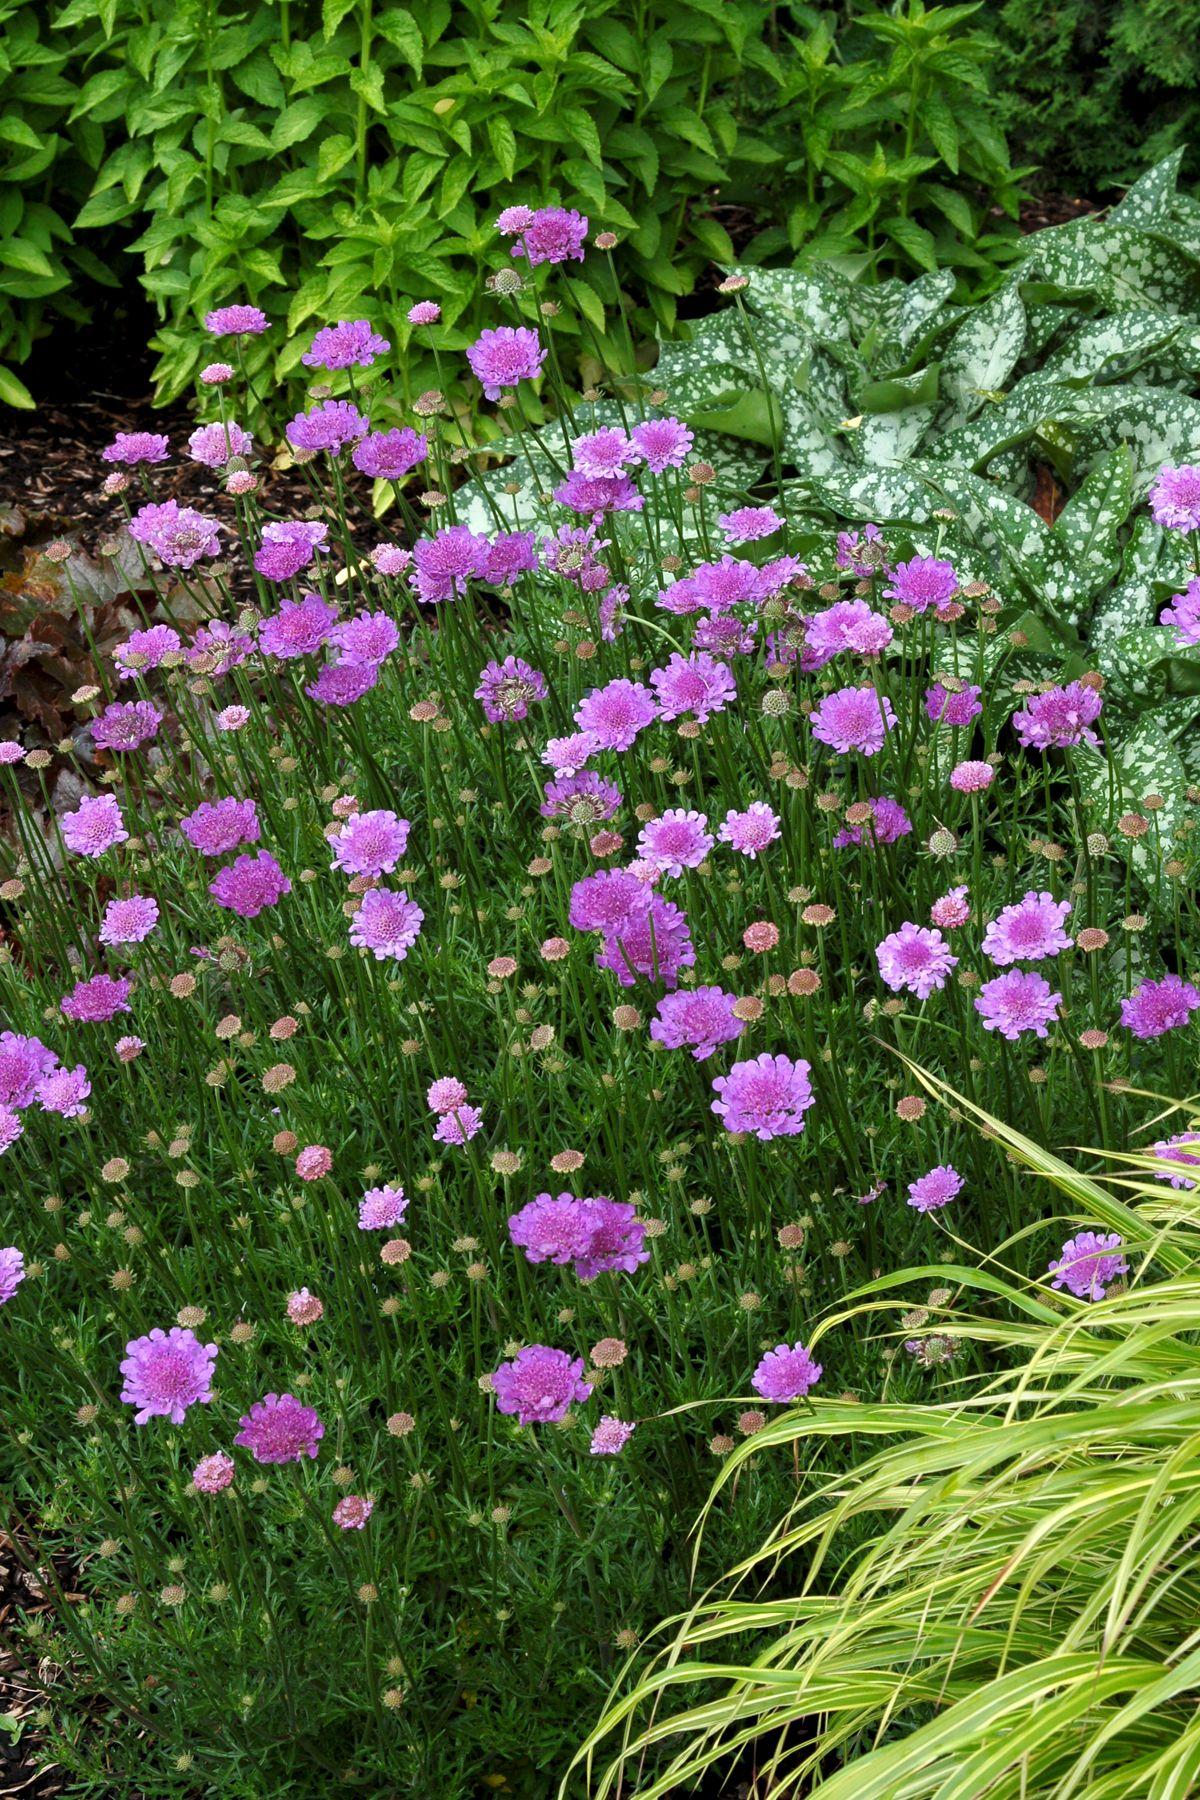 Pin By Robin Branhan On Gardening And Yard Ideas Pinterest